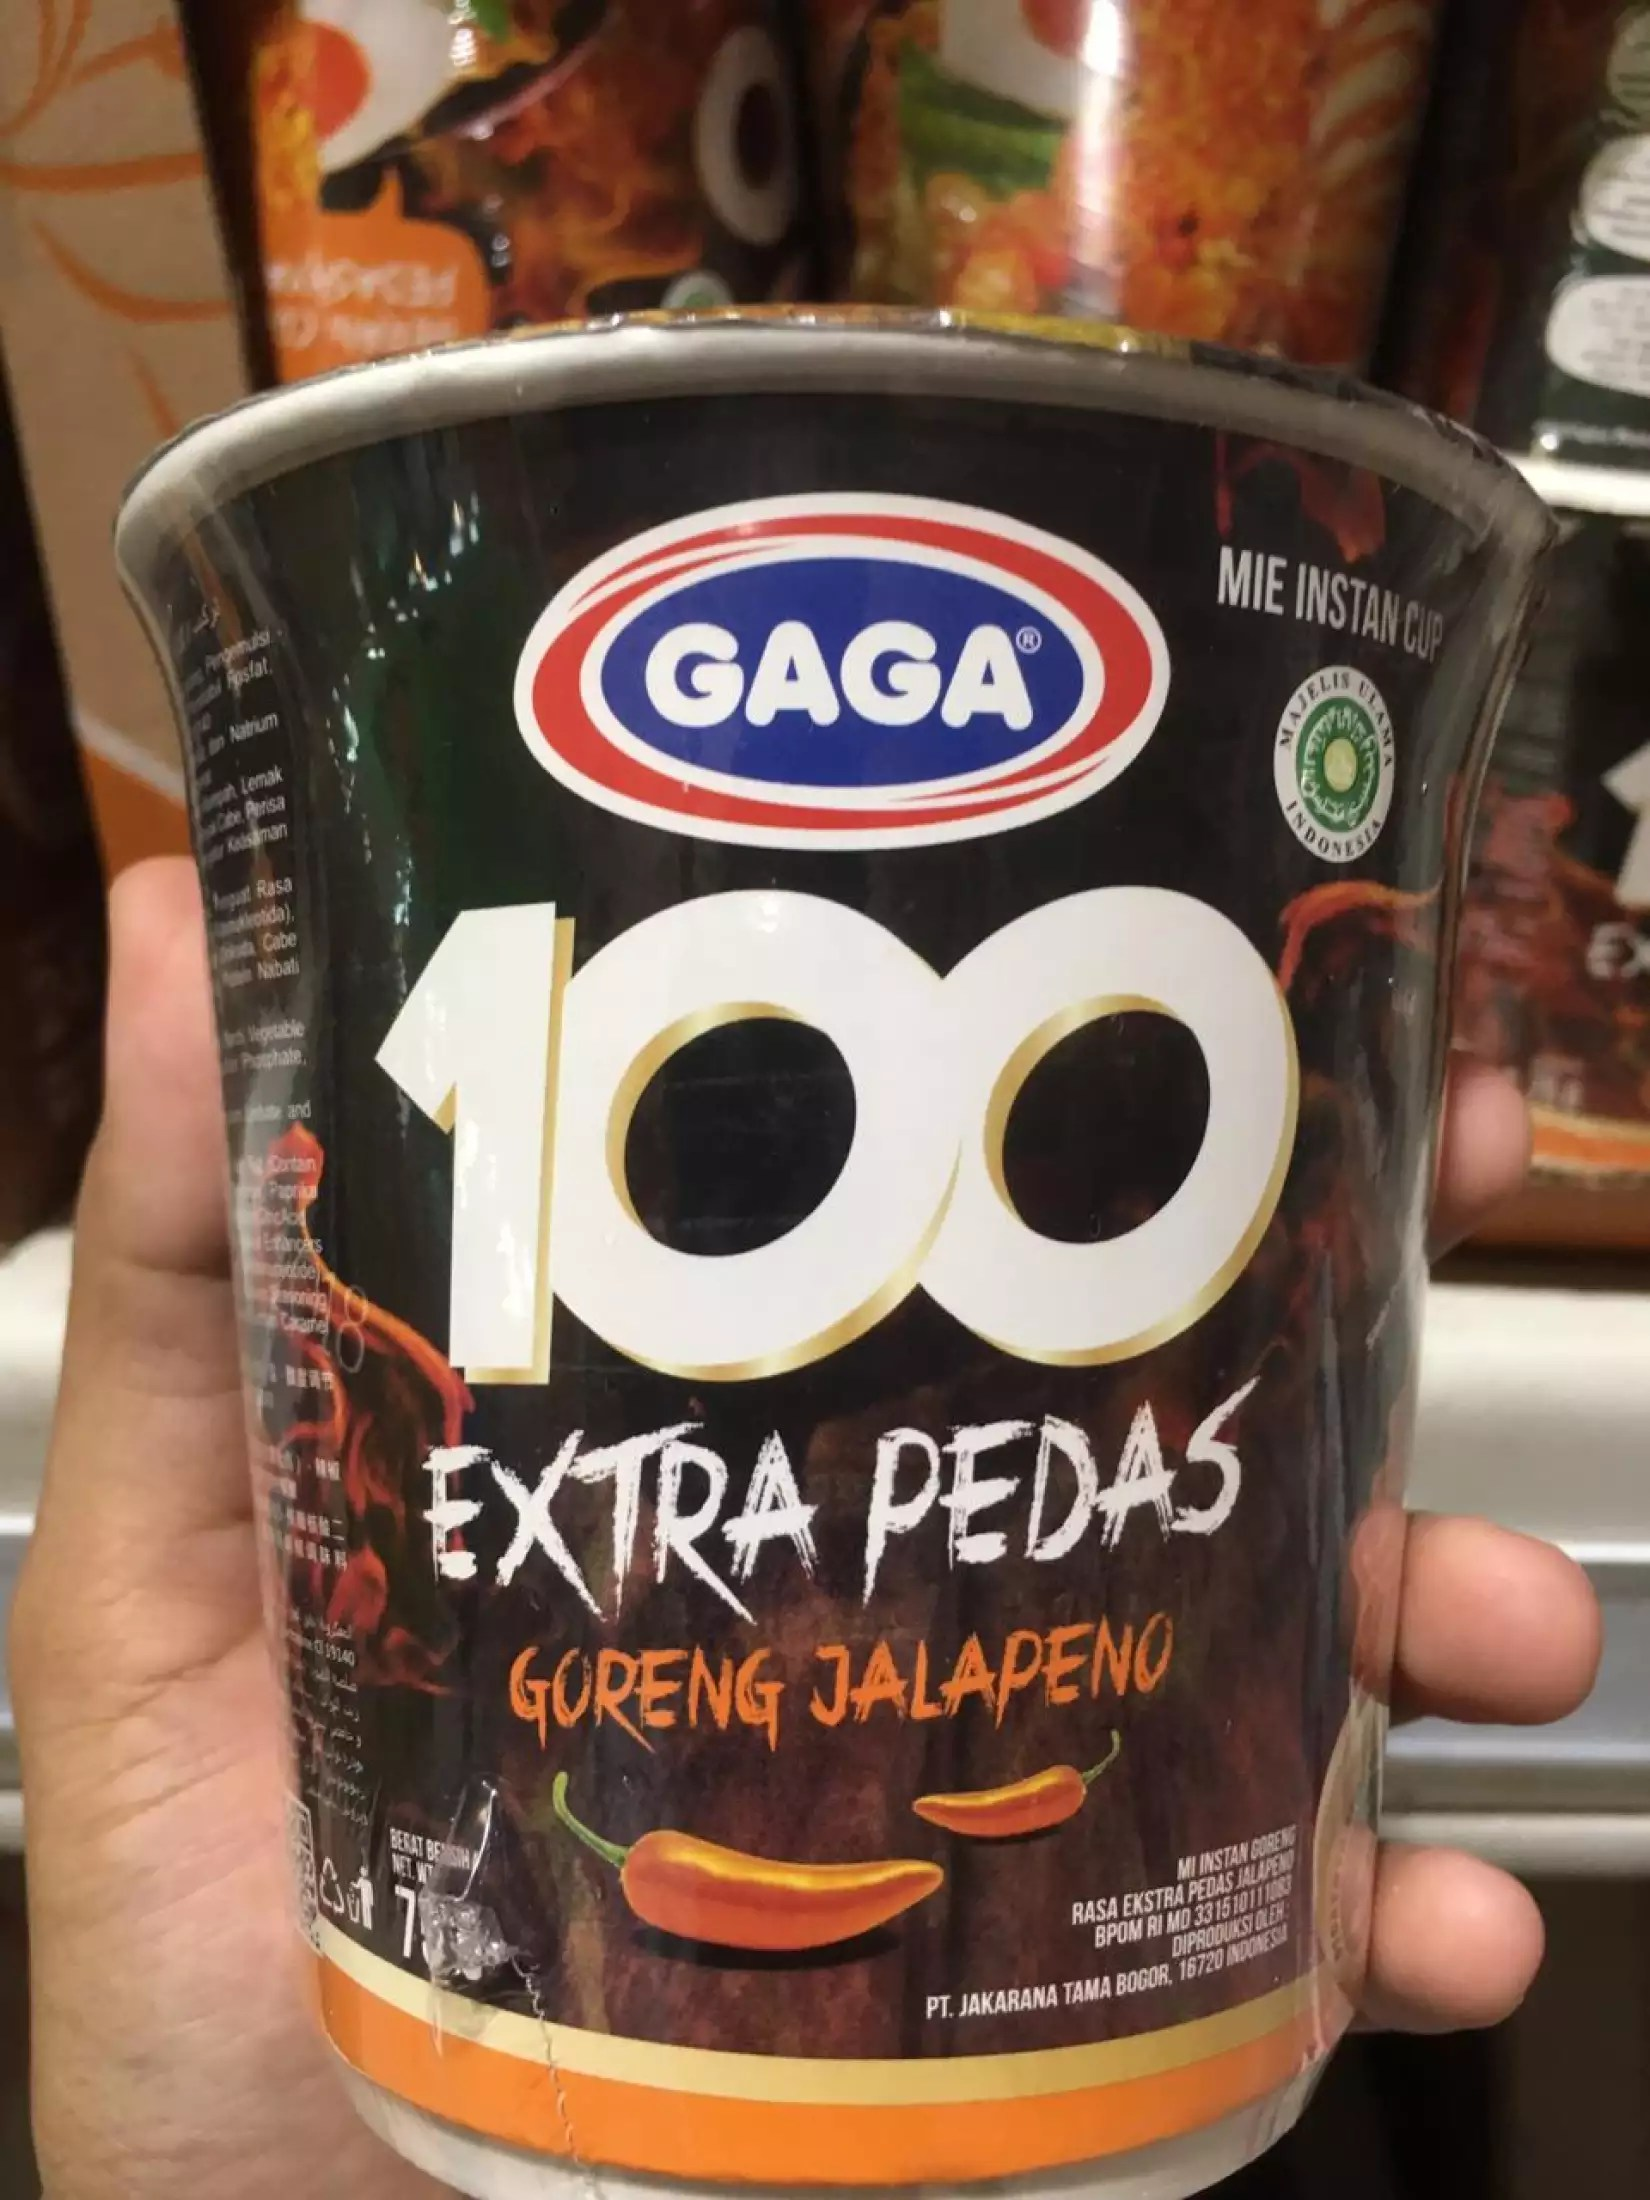 Mie Gaga 100 : Extra, Pedas, Goreng, Lazada, Indonesia